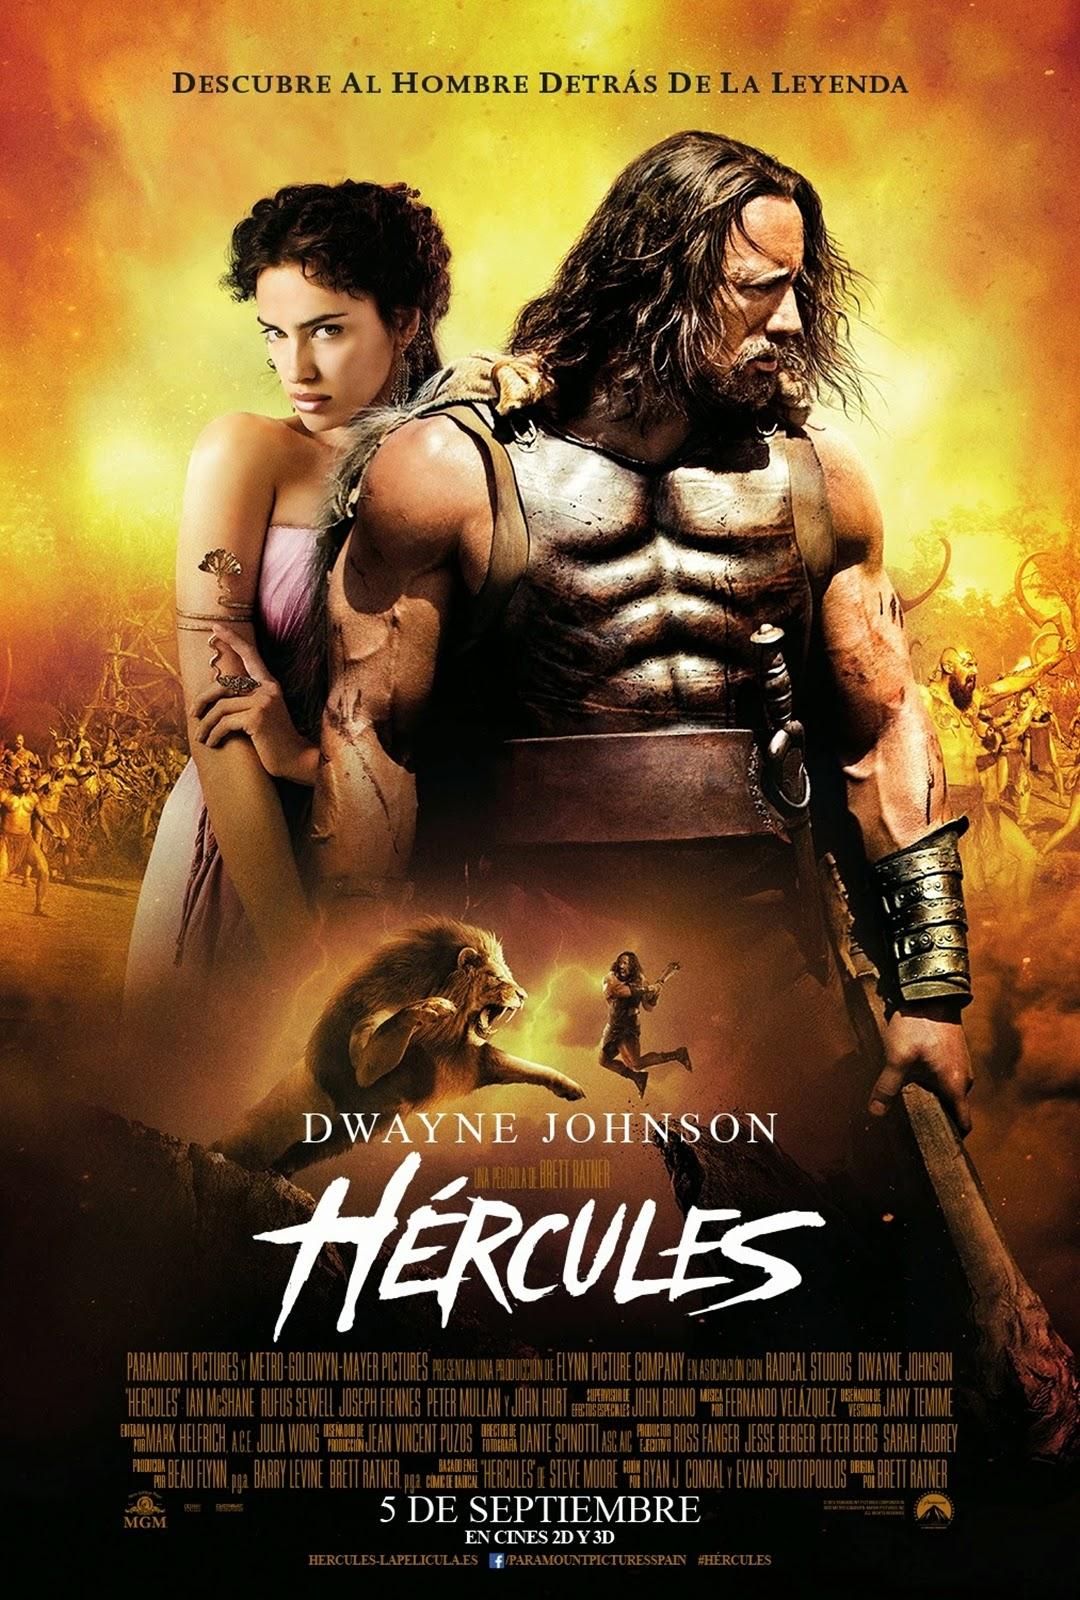 Hercules: The Thracian Wars 大力神 色雷斯之战 Hercules_The_Thracian_Wars_poster